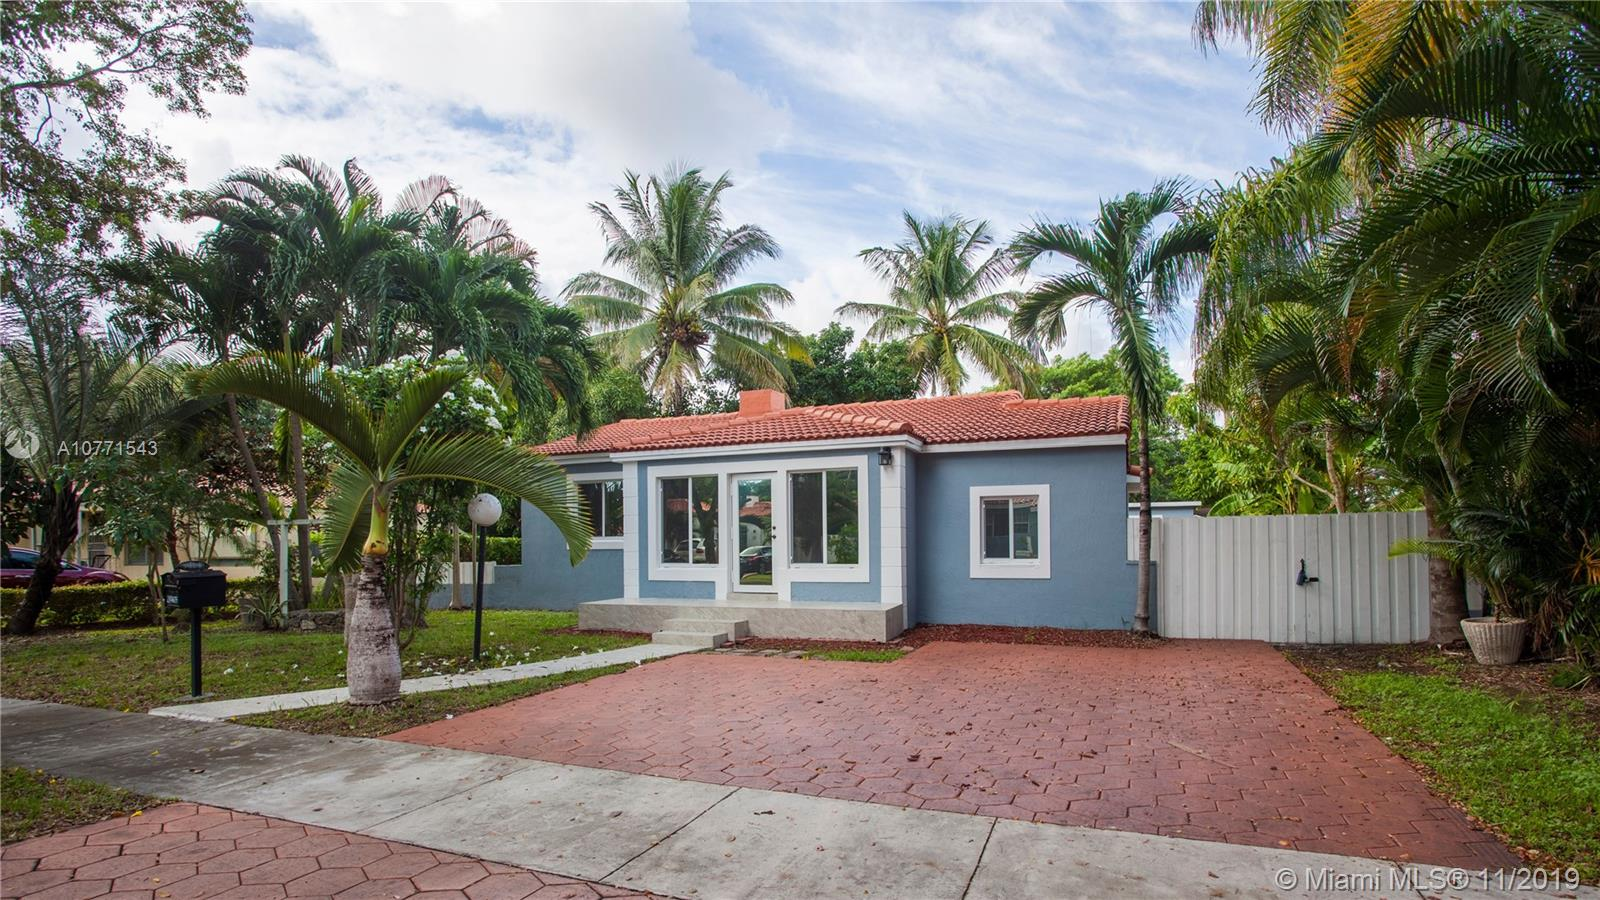 9426 NW 2nd Pl, Miami Shores, Florida